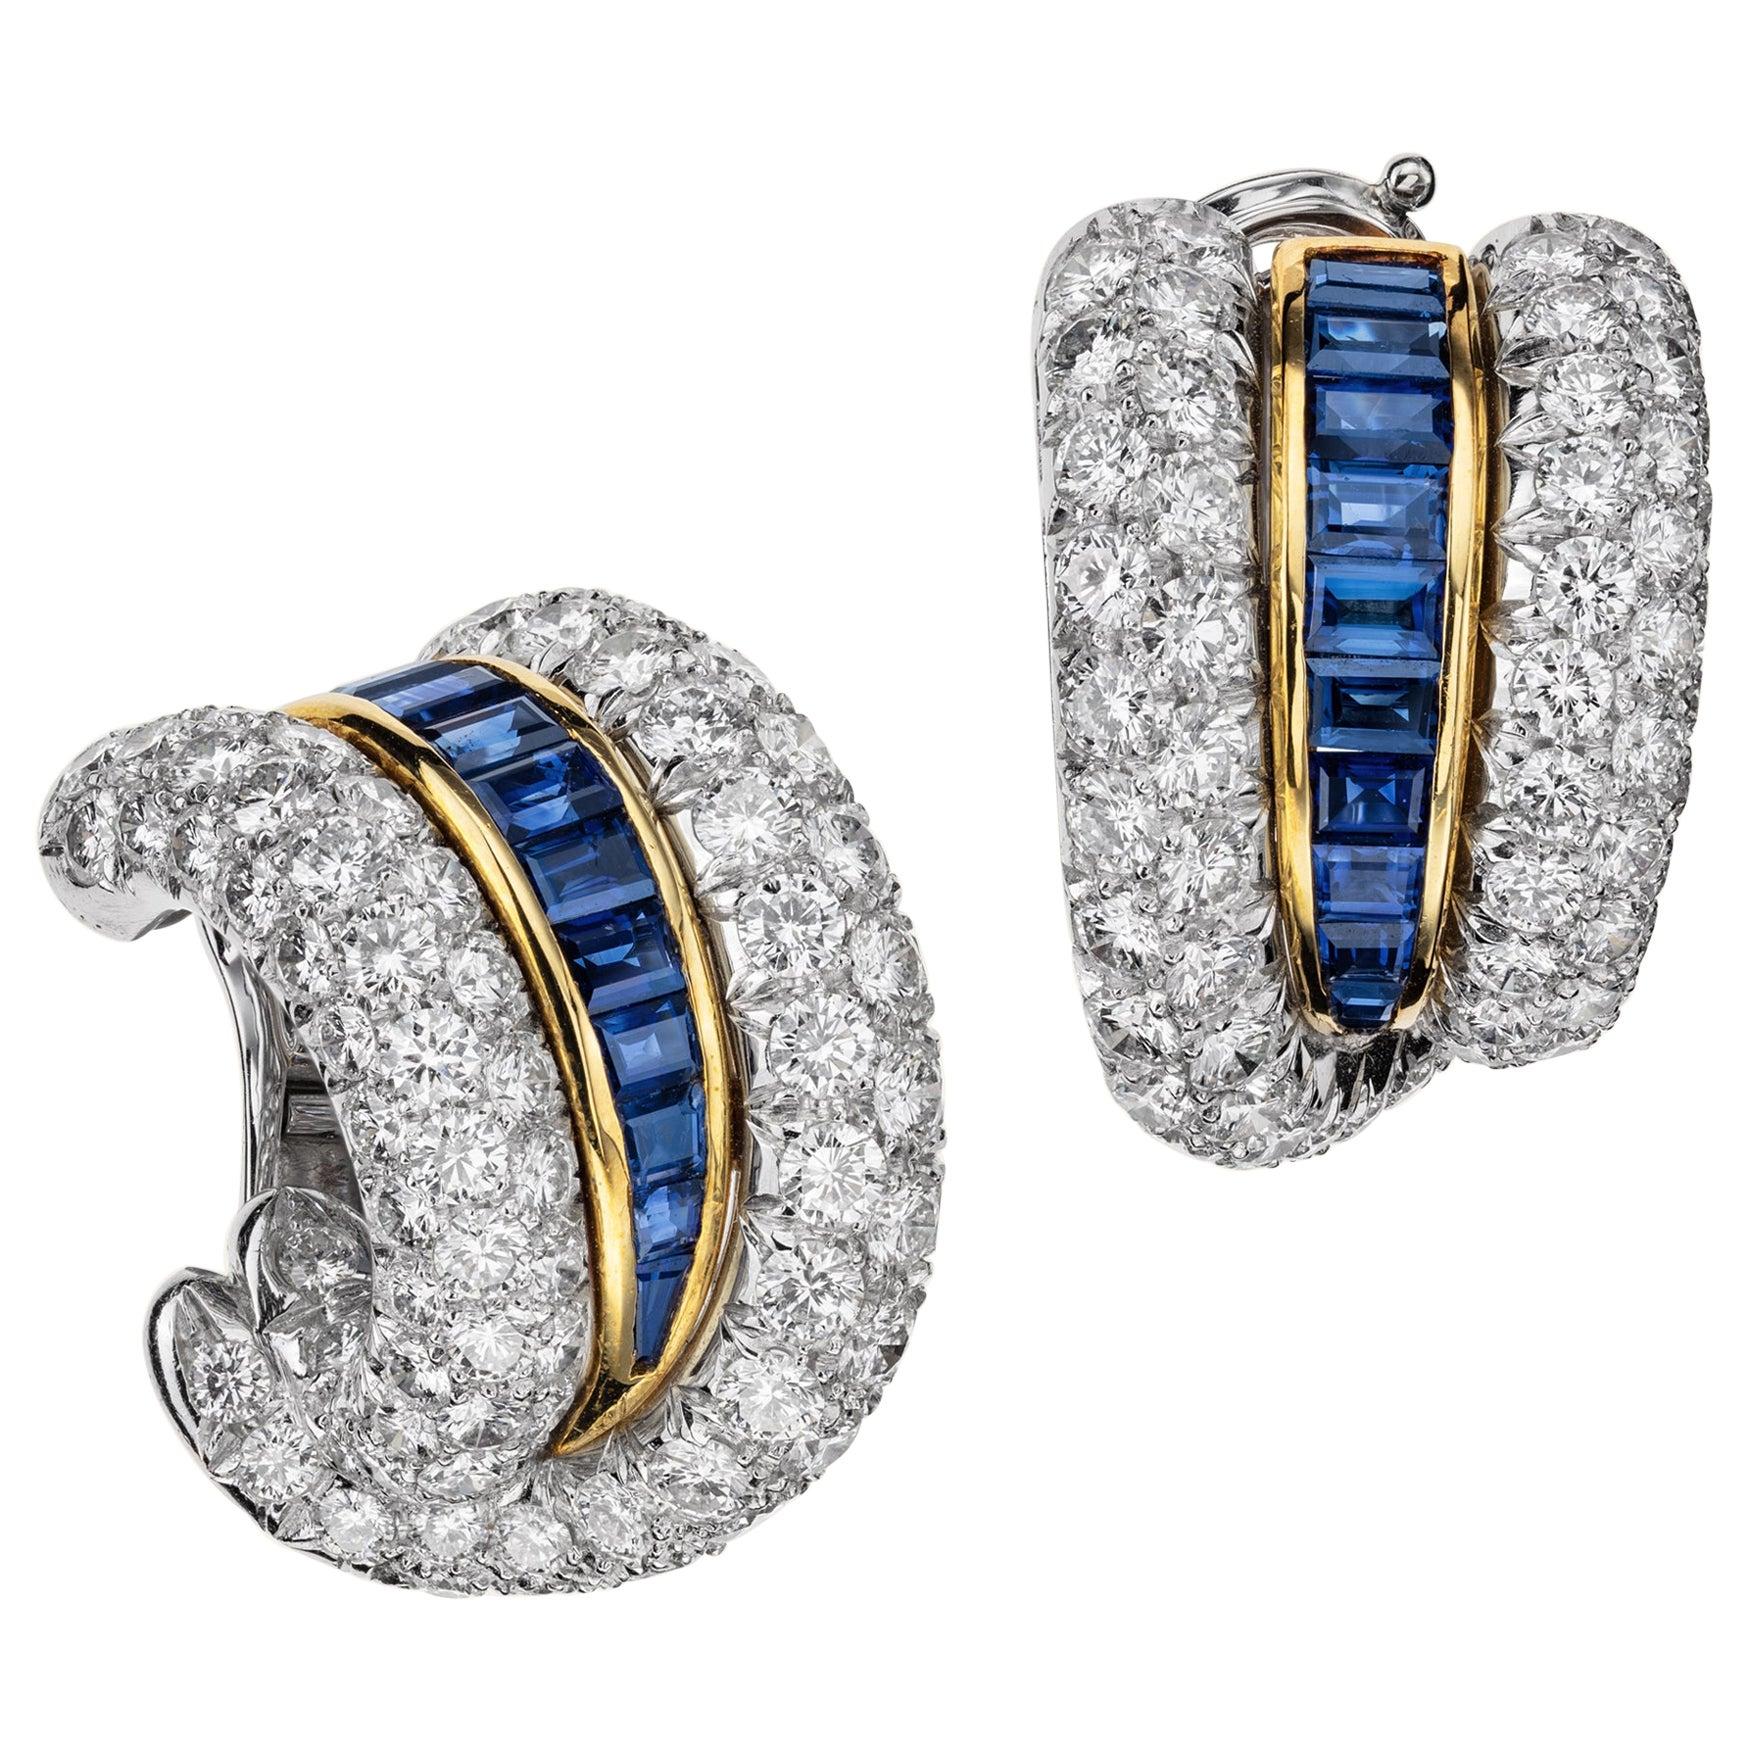 Sabbadini Platinum and Diamond Earrings with Blue Sapphires